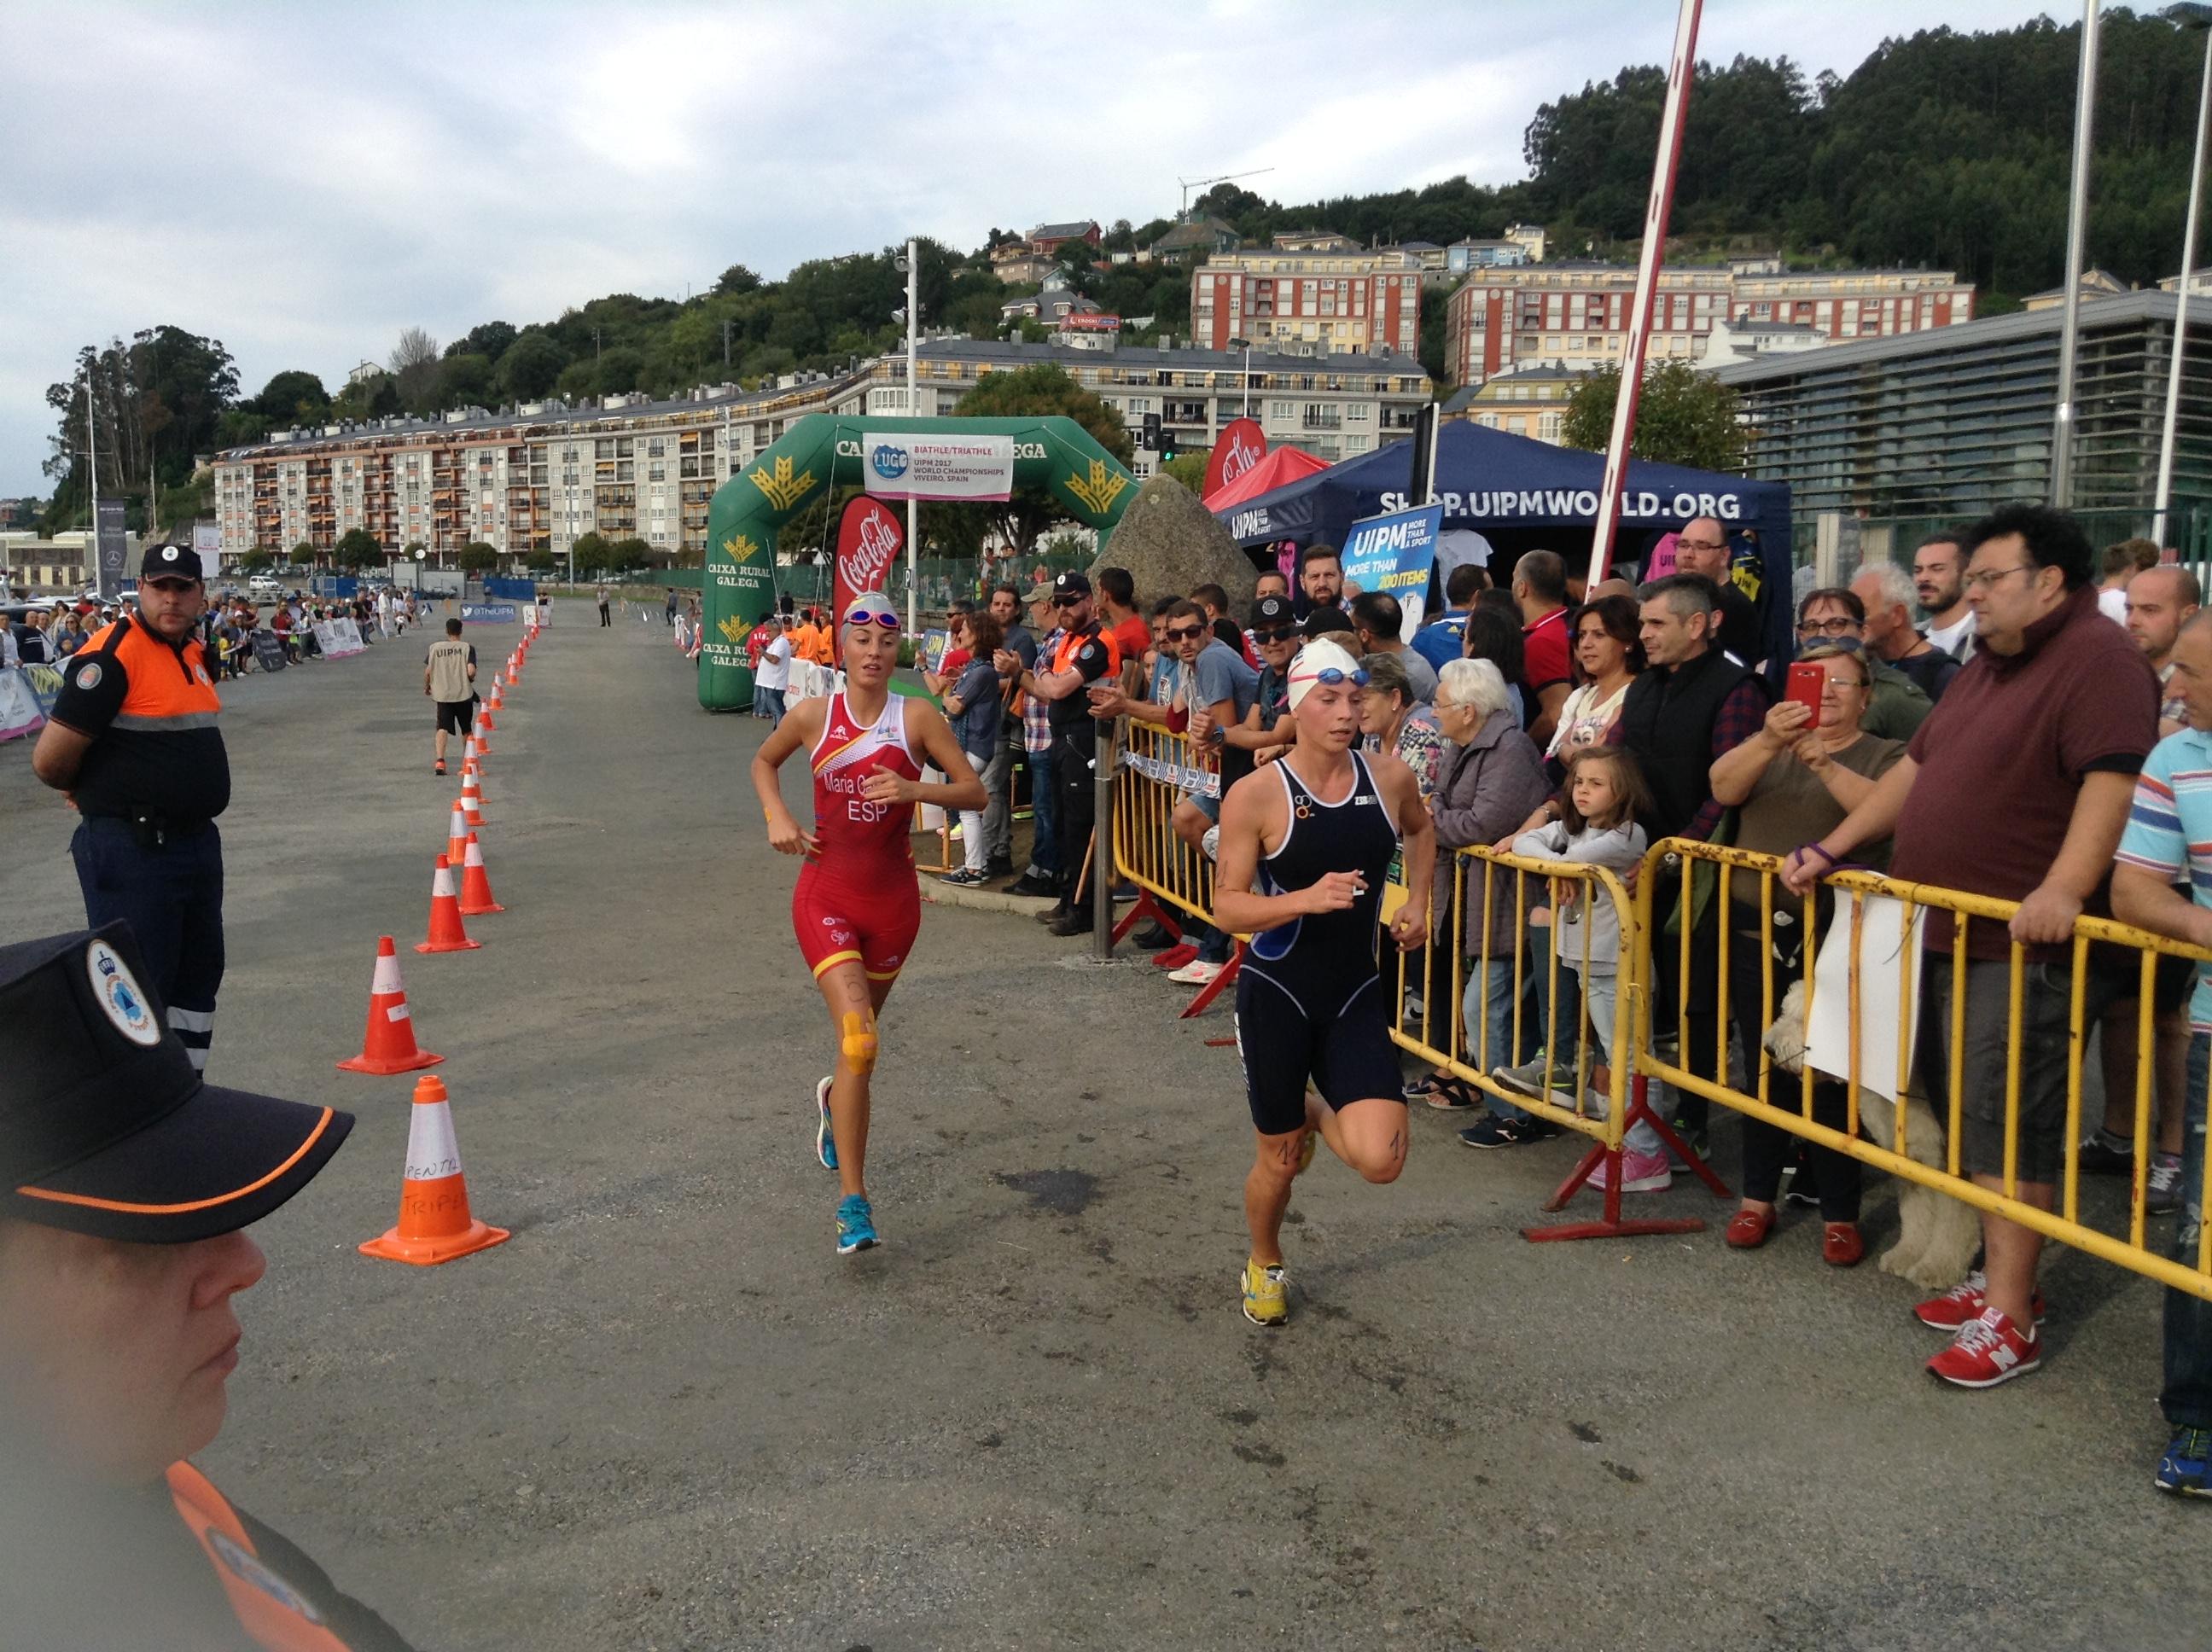 Ipad tercera jornada triatle 23.9.17